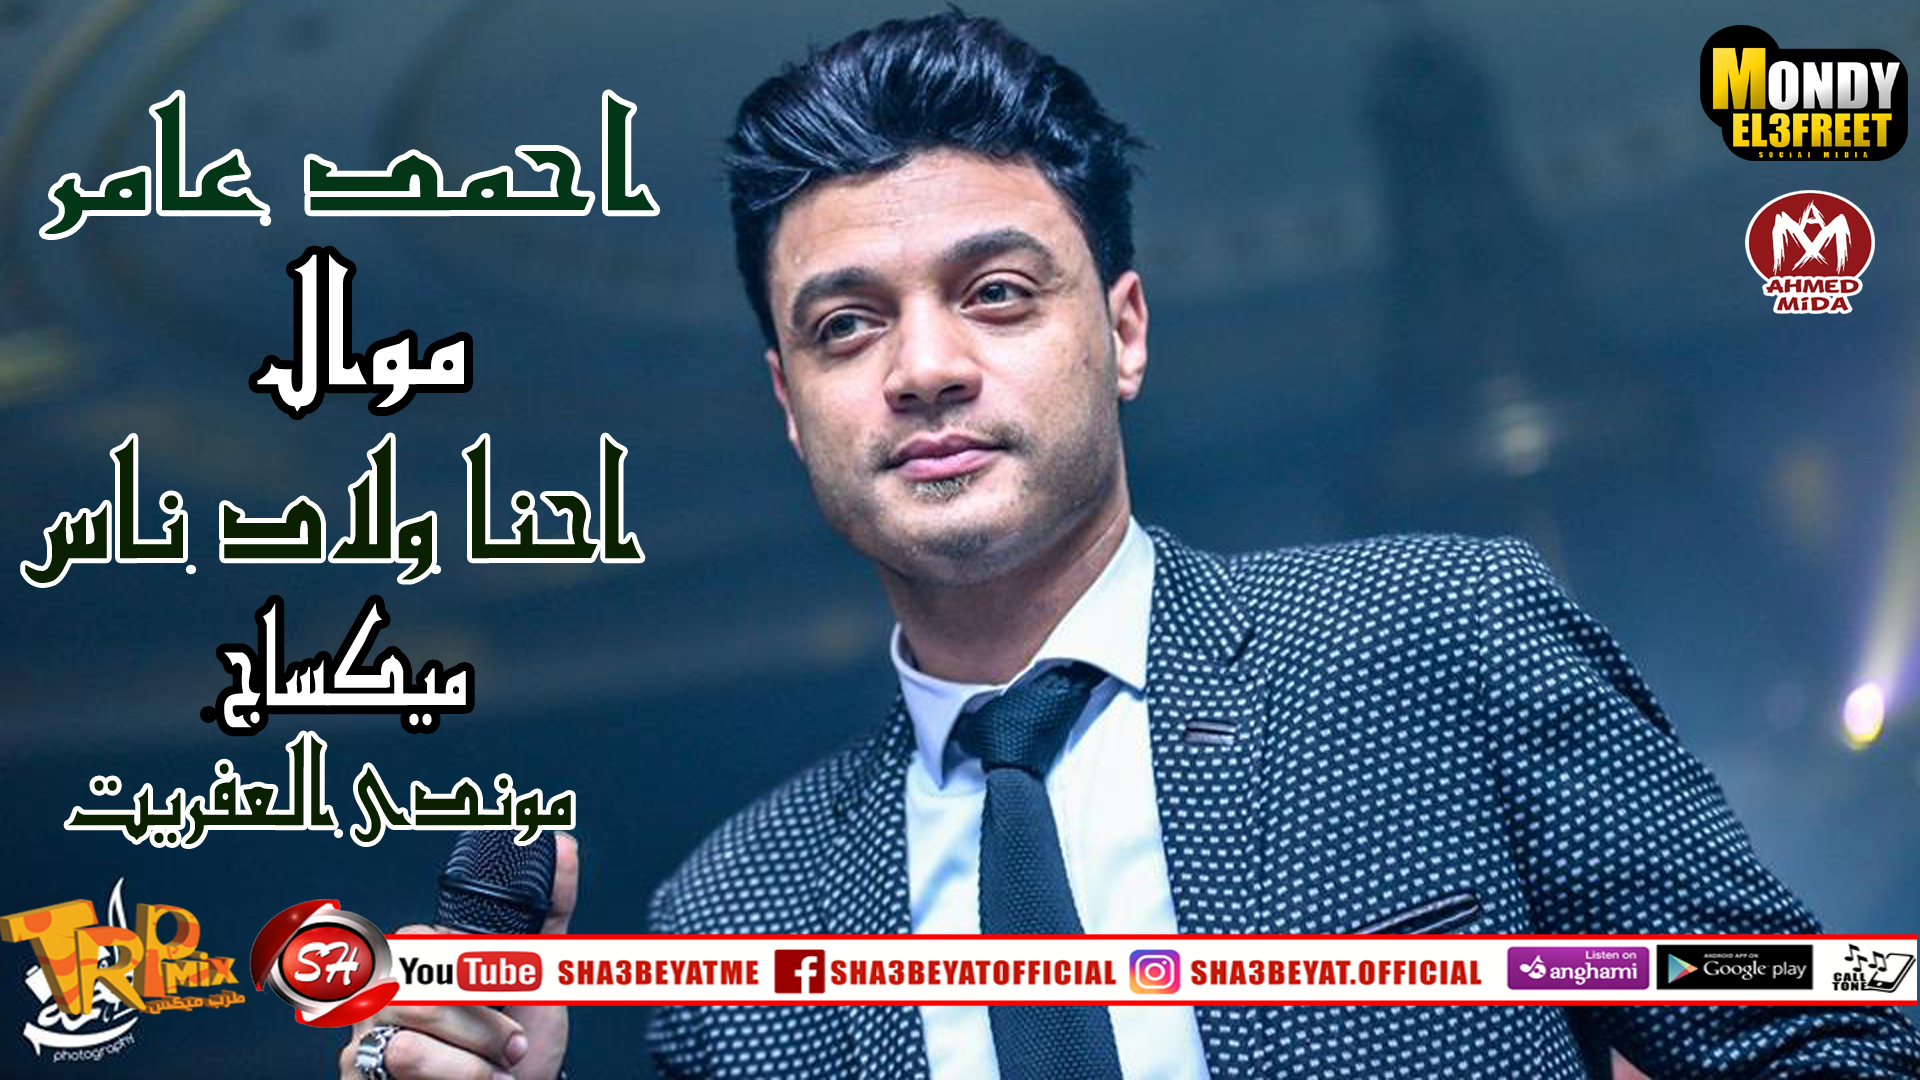 احمد عامر 2018 موال احنا ولاد ناس جديد حزين مووت هيخرب مصر.mp3